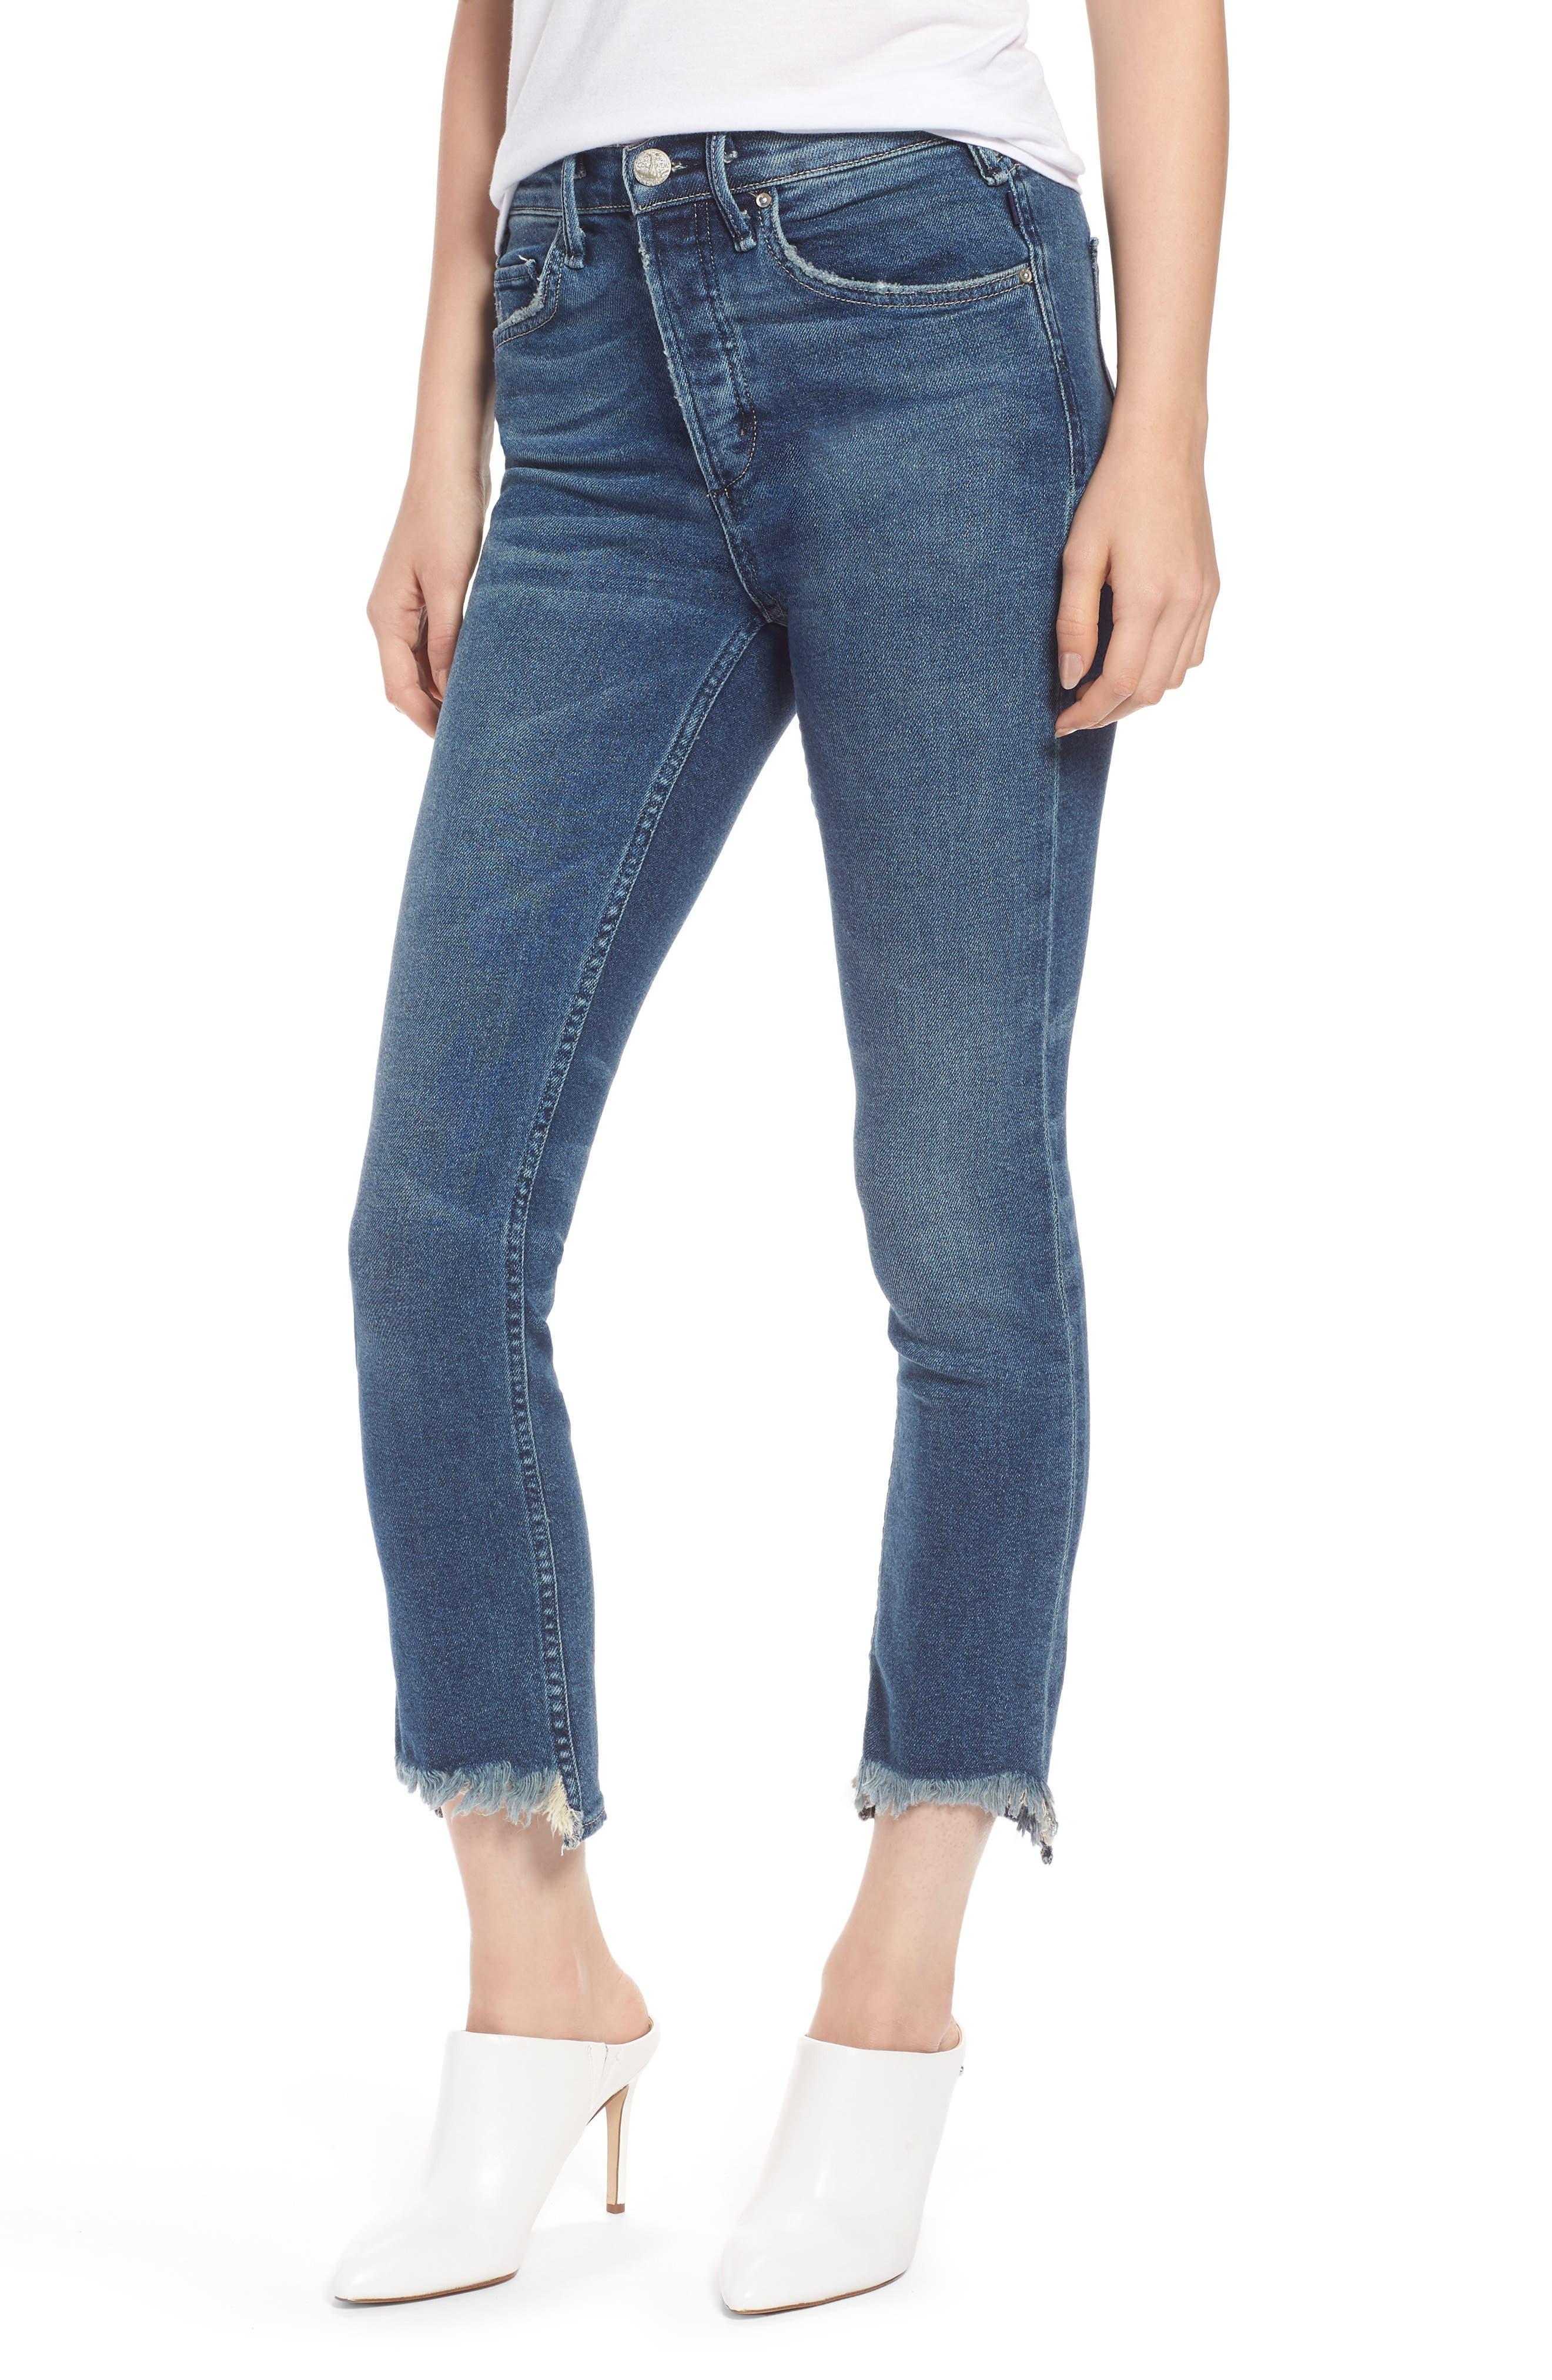 Valetta High Waist Crop Straight Leg Jeans,                         Main,                         color, Way Up North